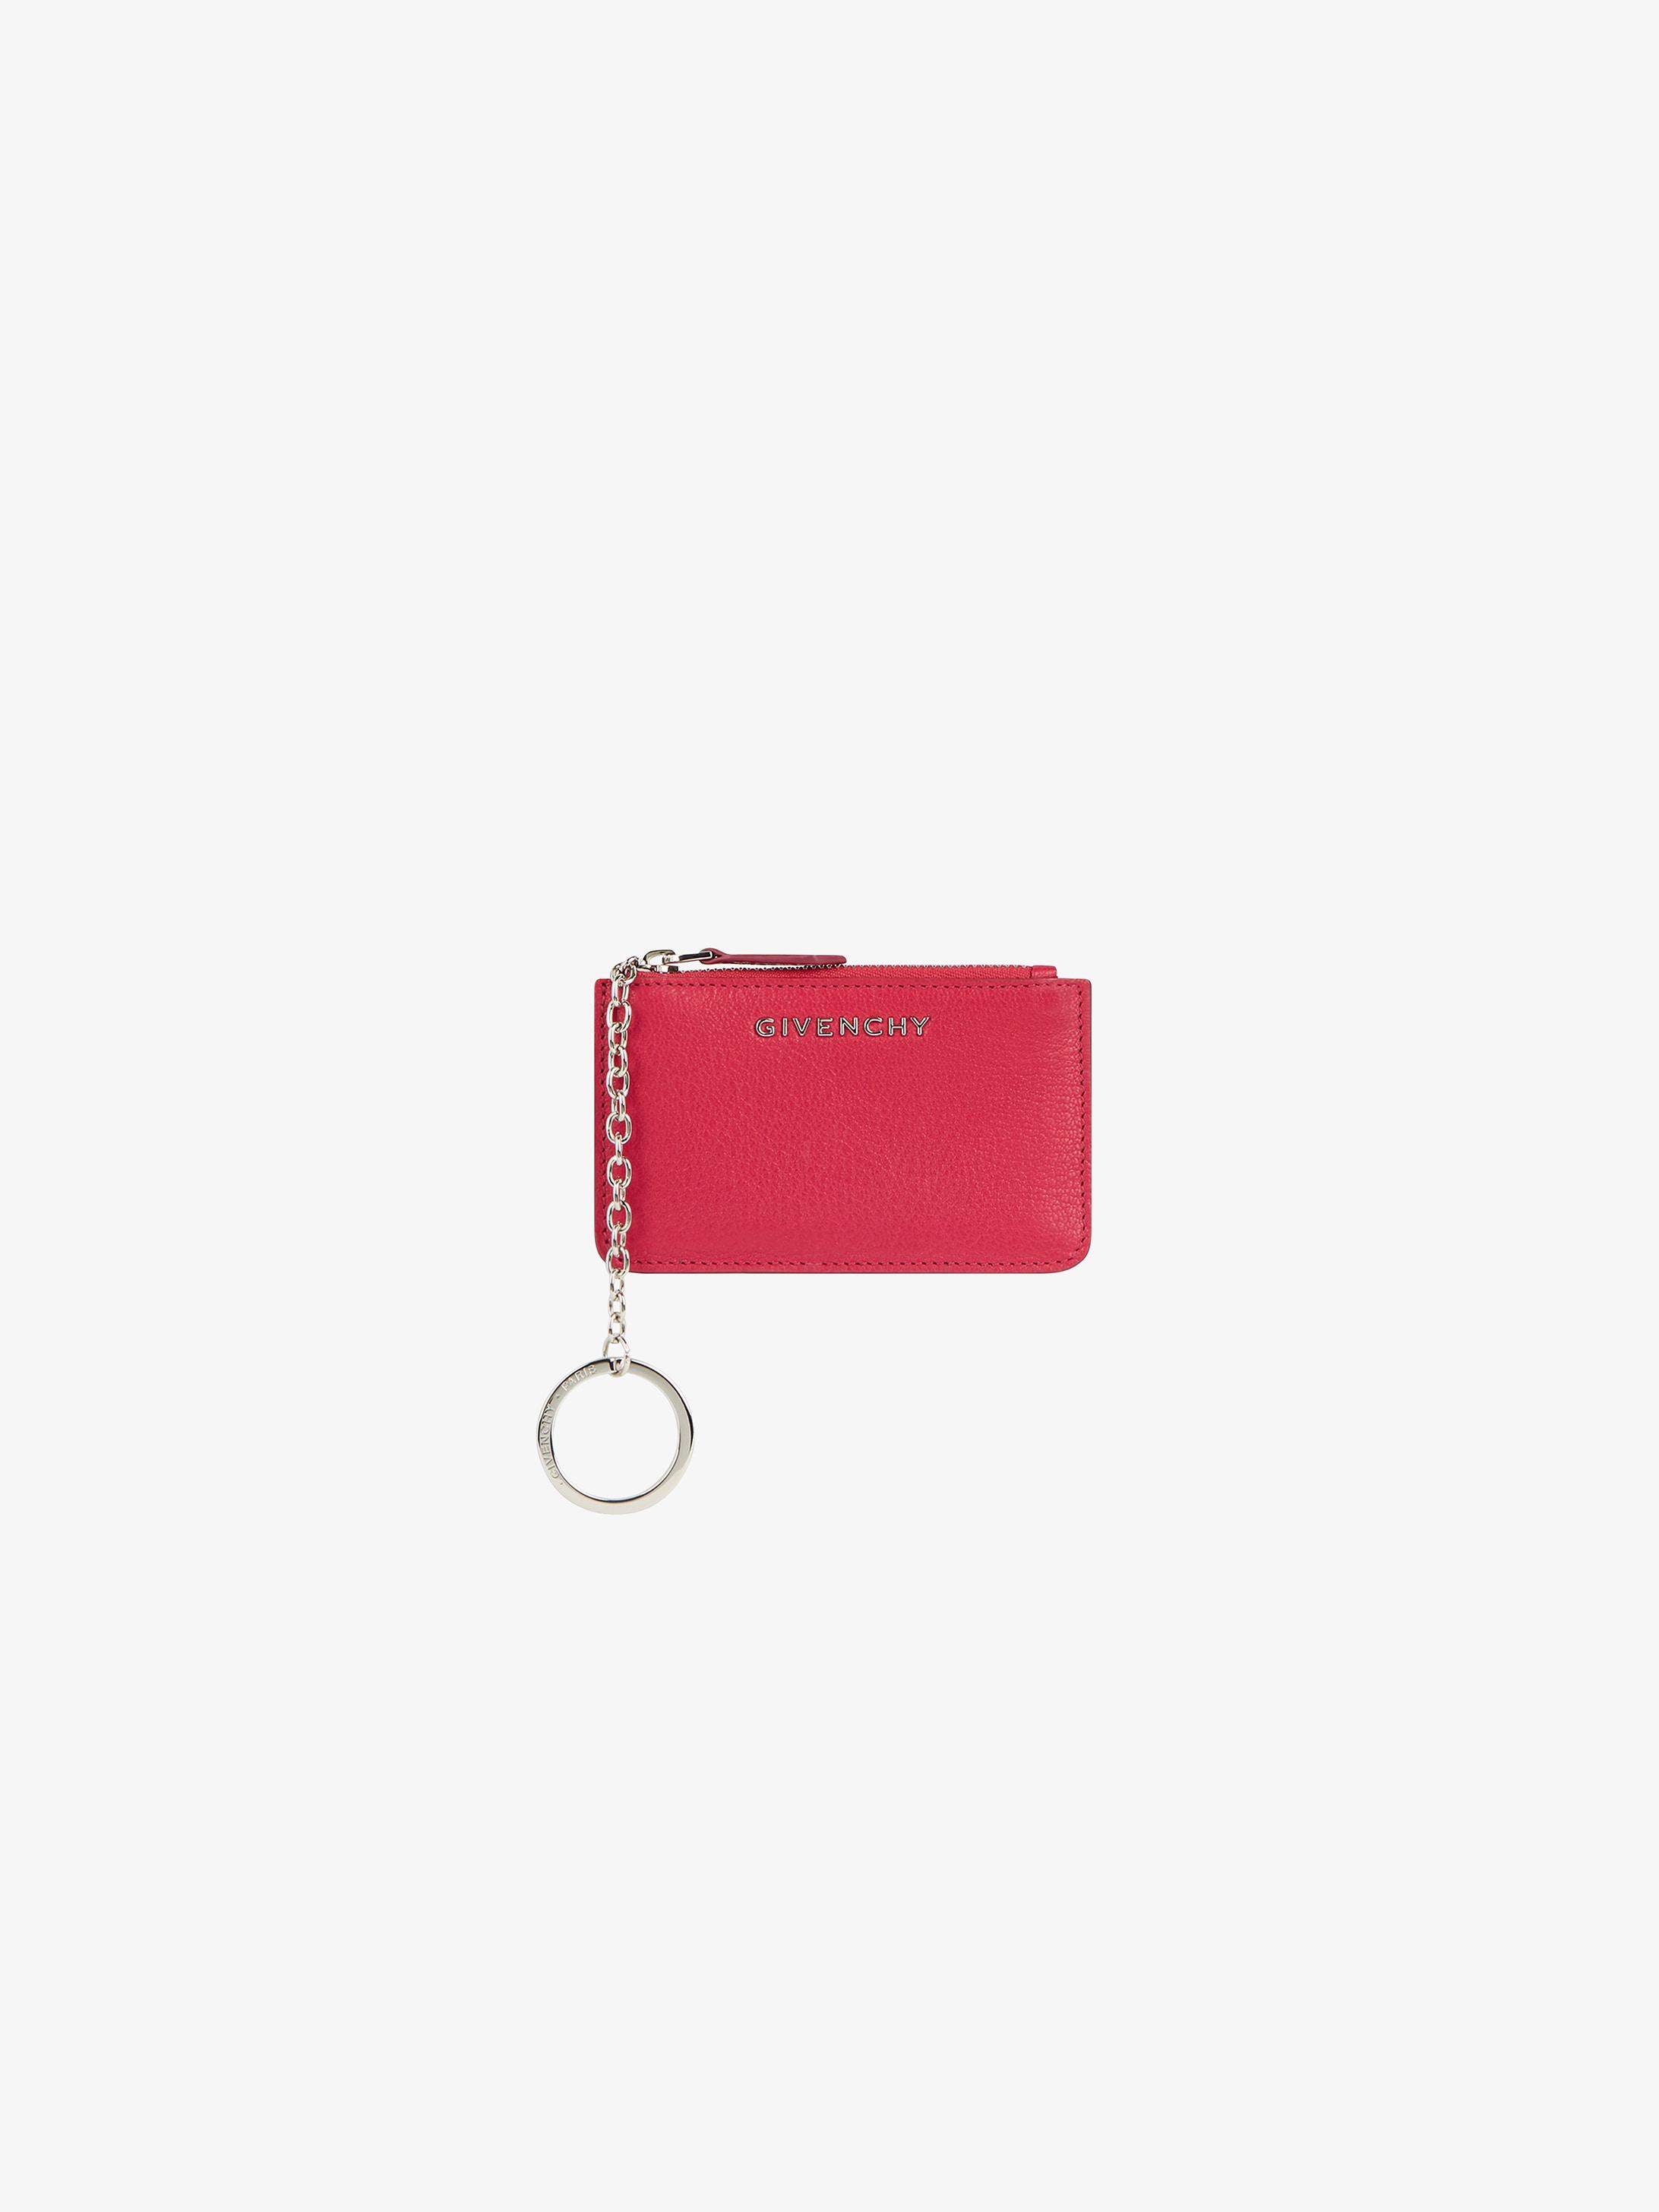 Pandora zipped  key-holder